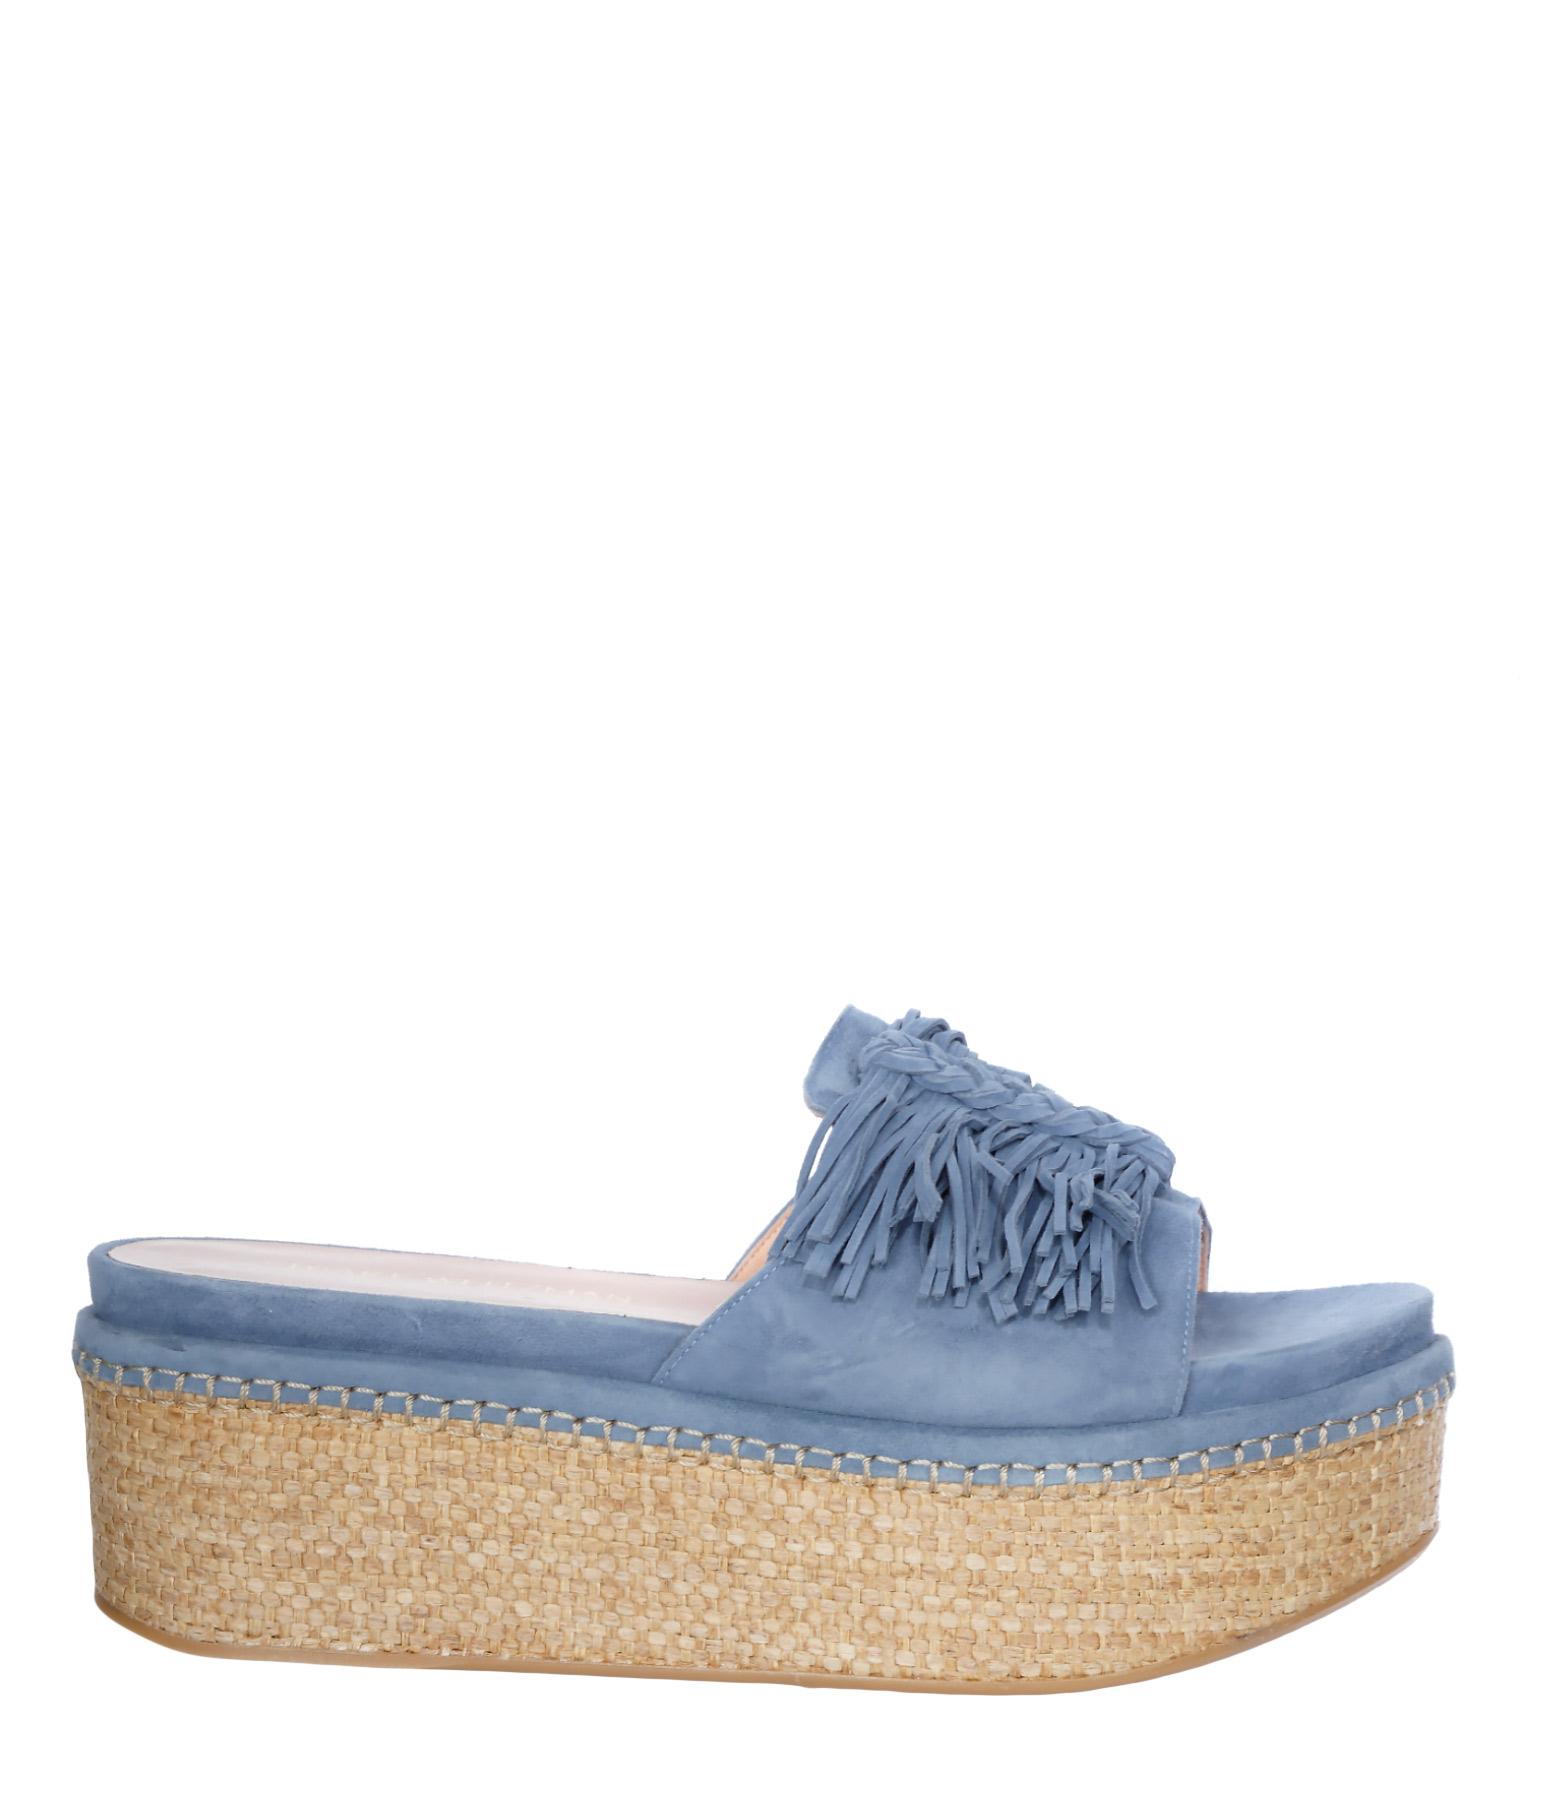 Sandales Compensées Wiggleroom Jean Suede